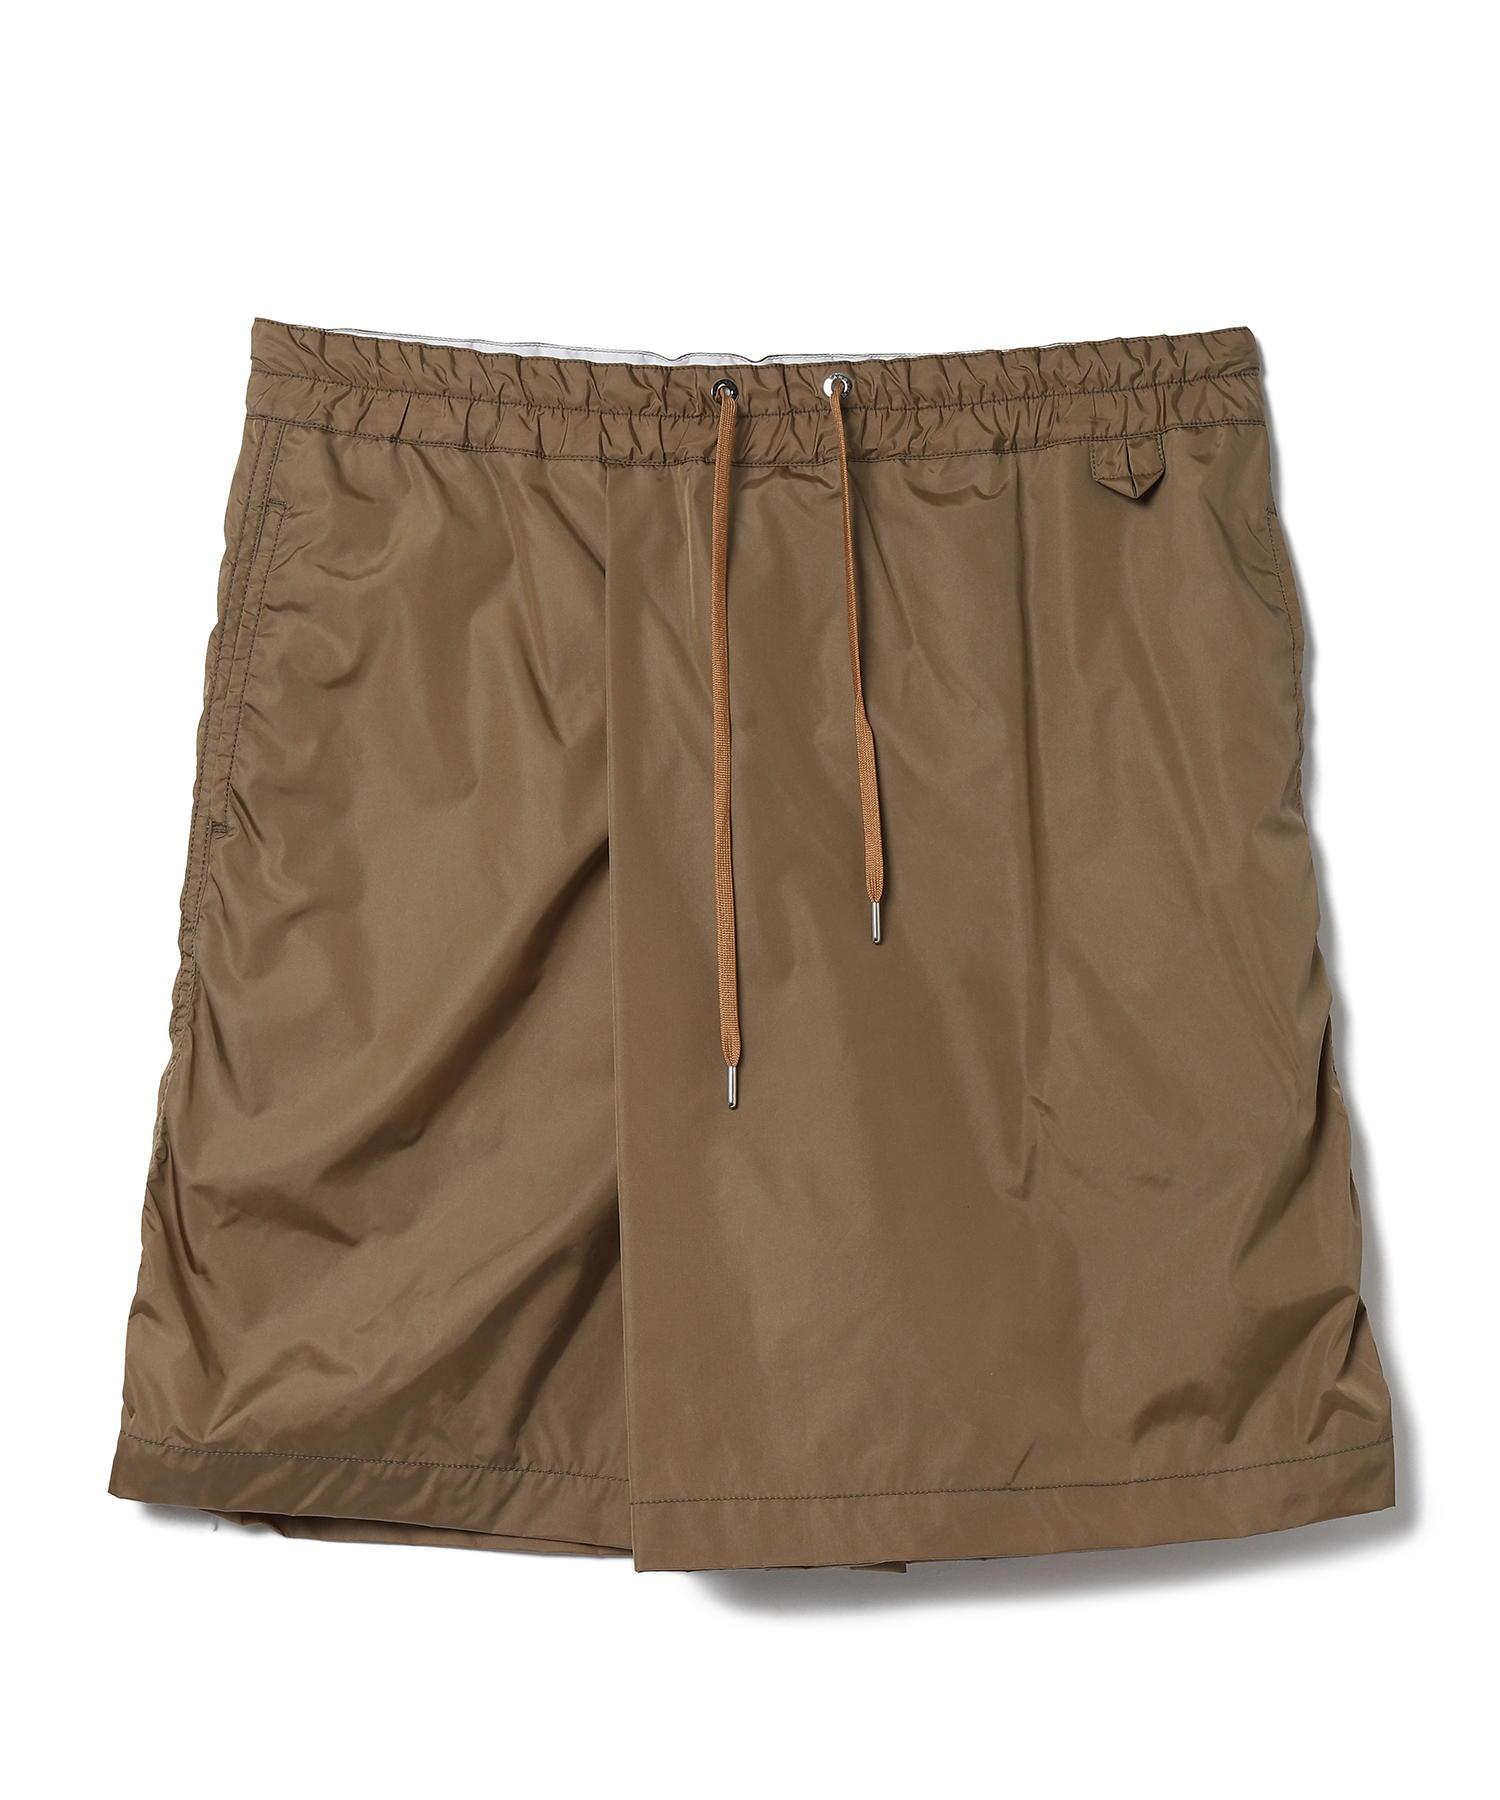 MAISTORE Micro Pant L schwarz Shorts 210732